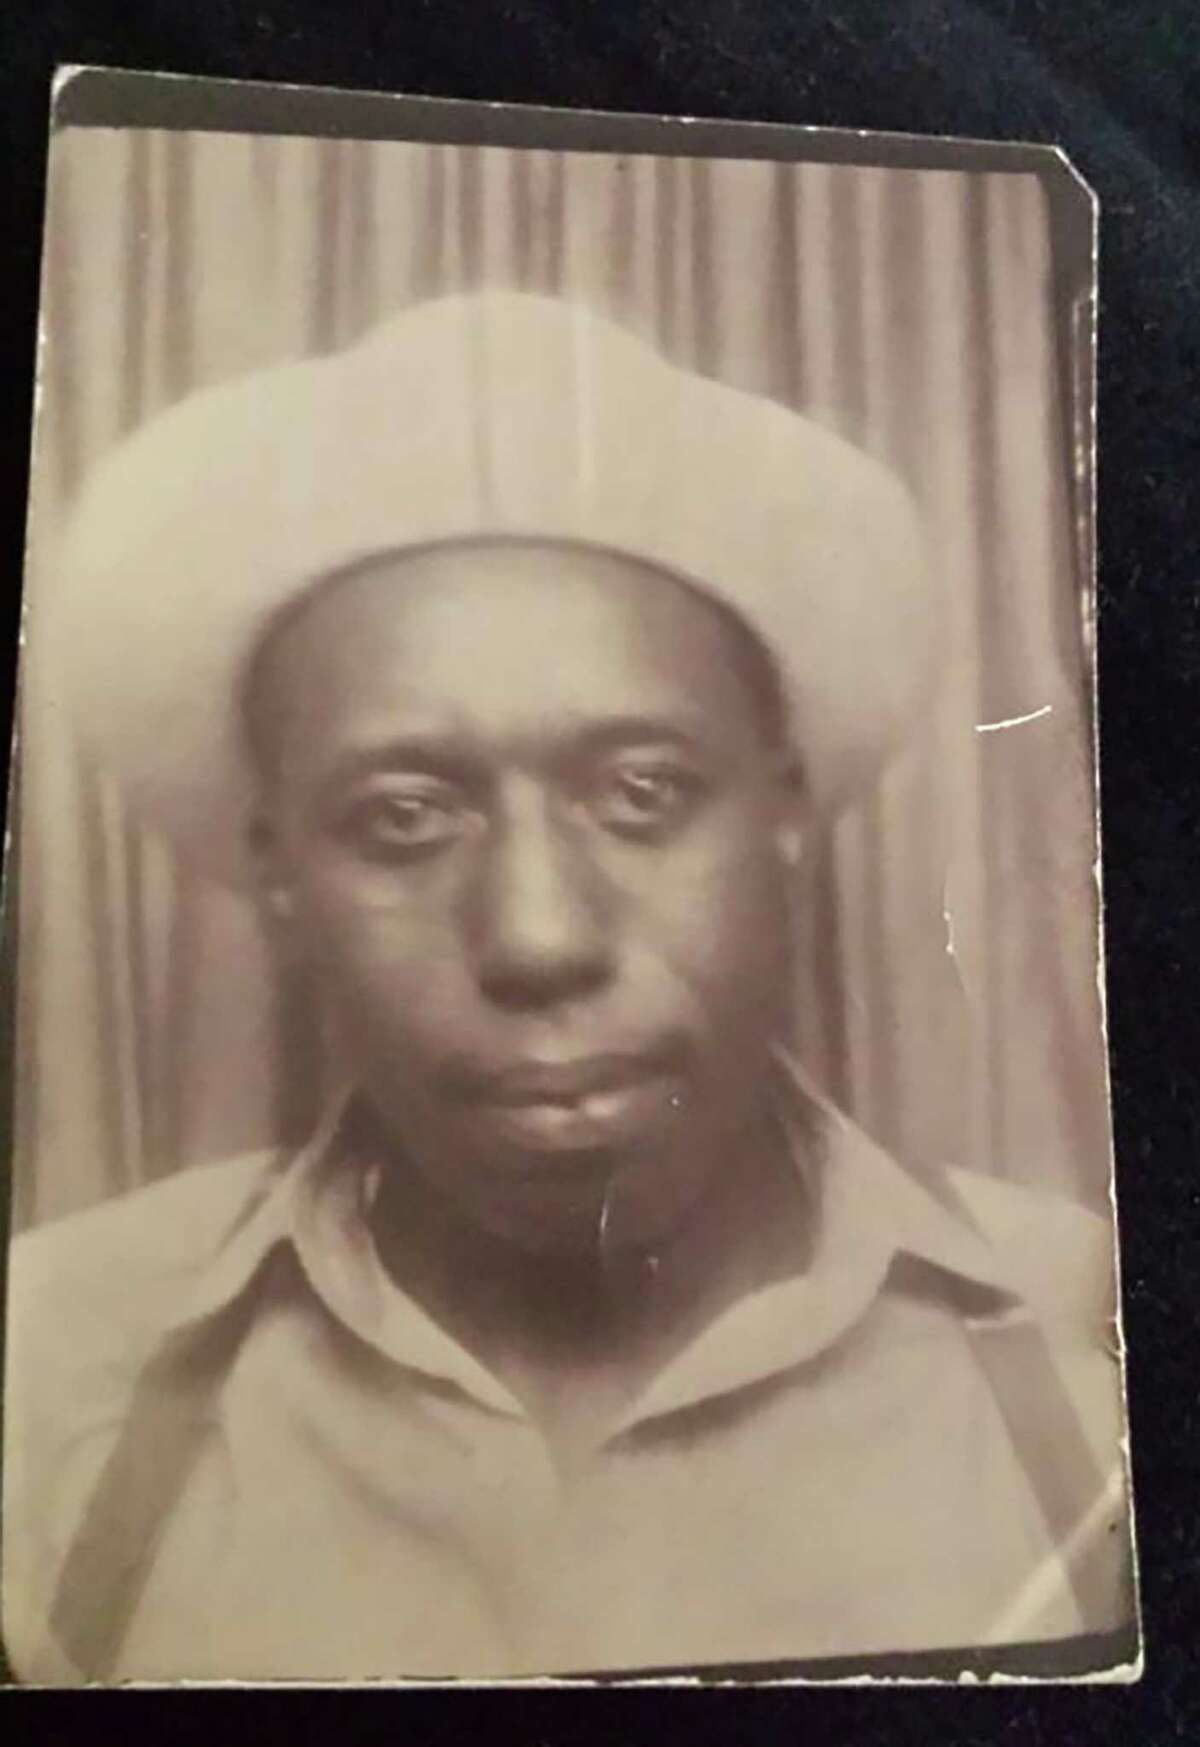 Thomas Finch was killed in Atlanta police custody on Sept. 12, 1936.